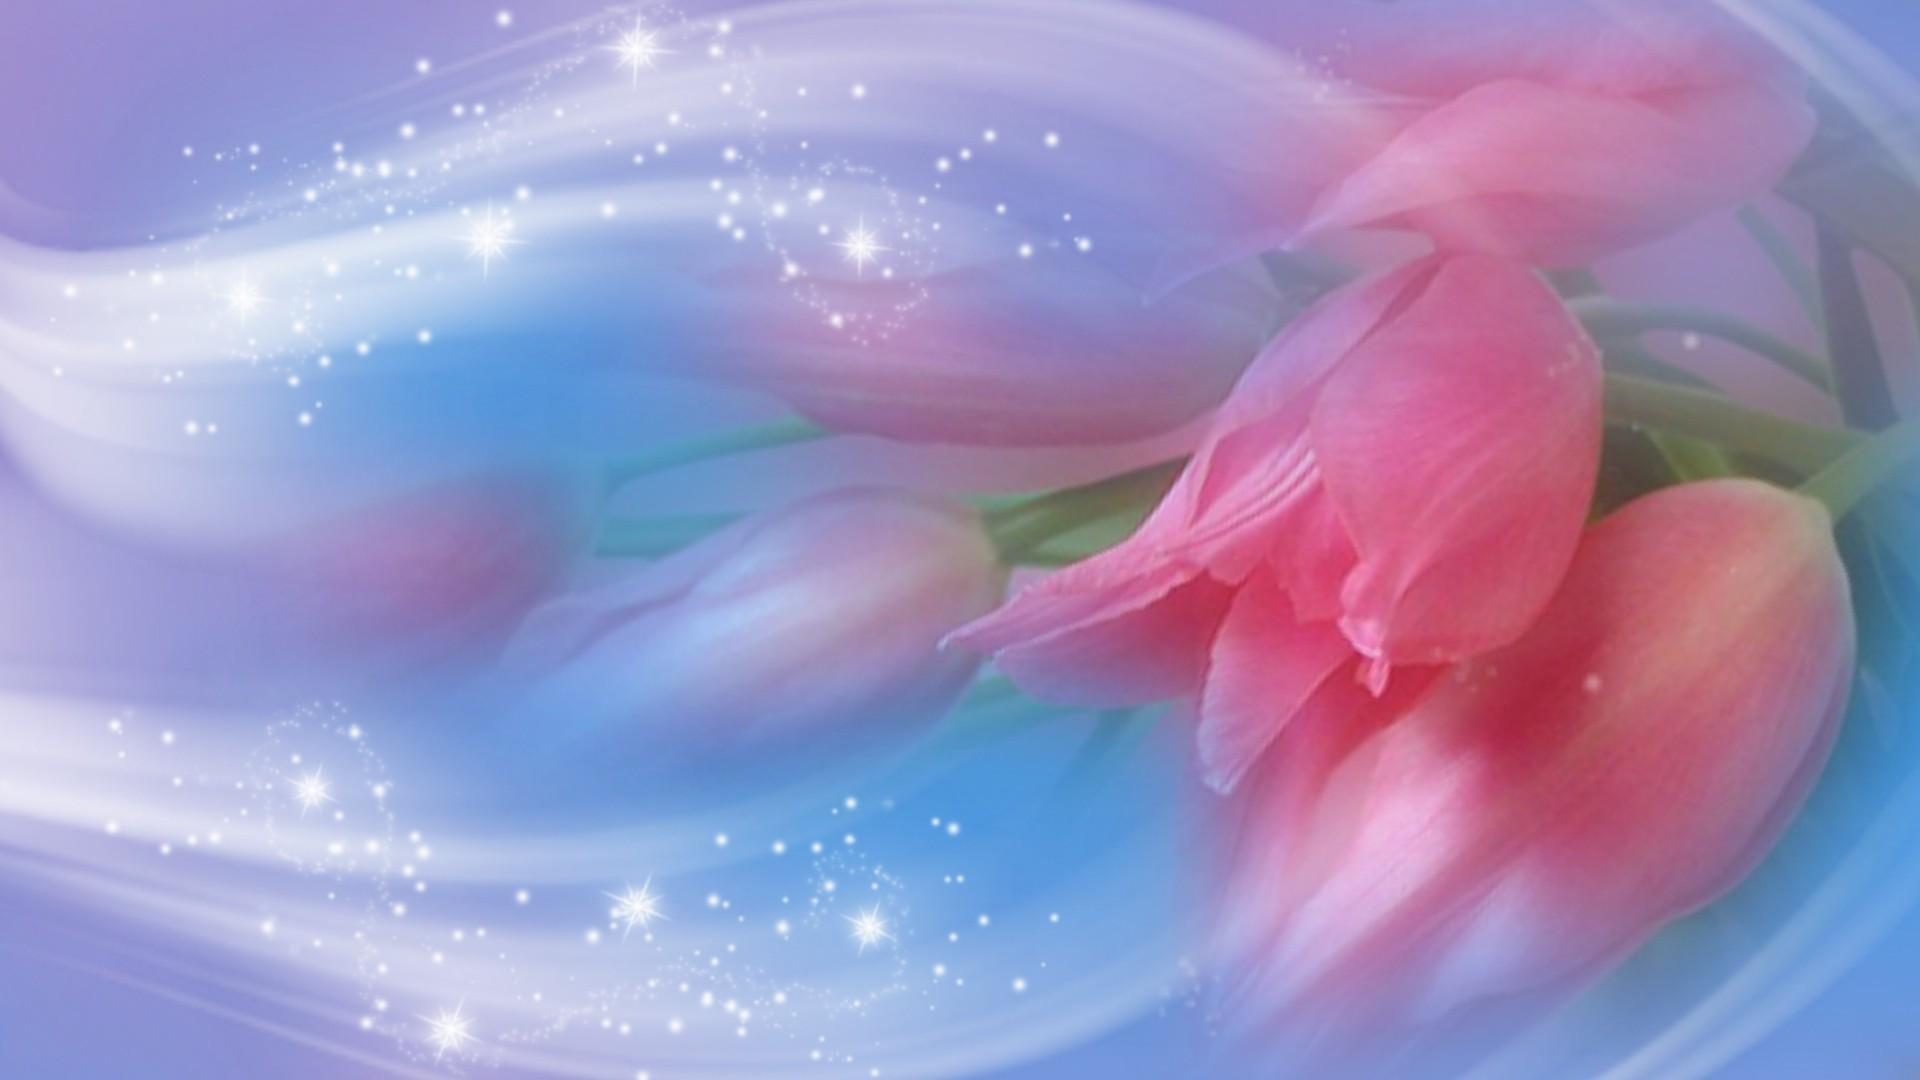 flowers: romantic pretty blue flower pink cute wallpaper ios 8 for